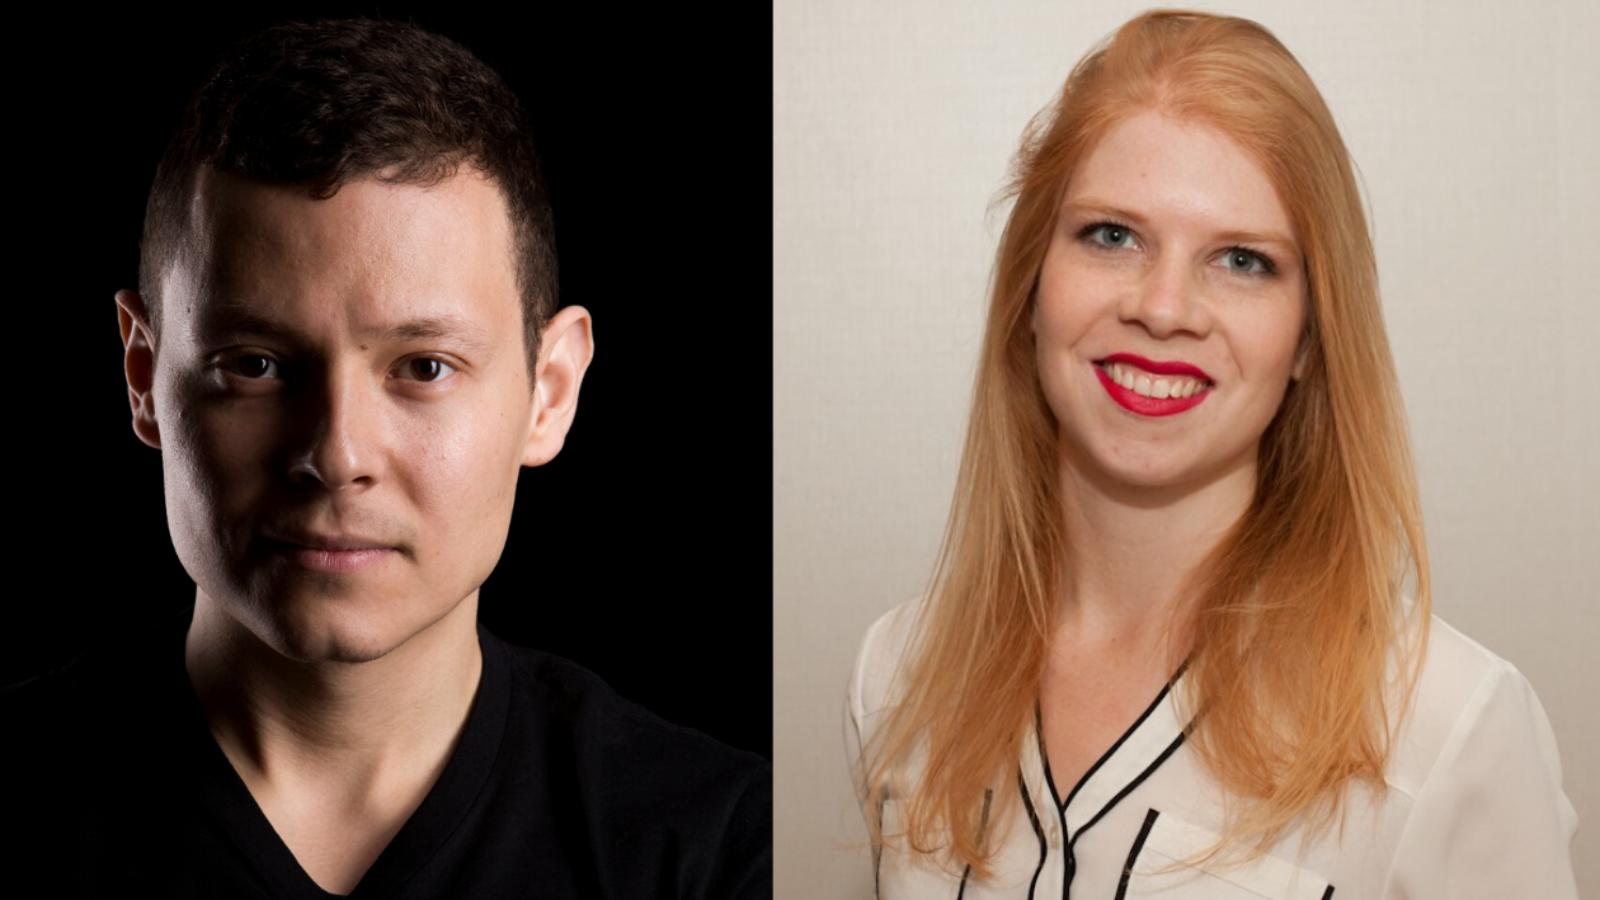 Headshots of Christoper Wall and Kristina Drye